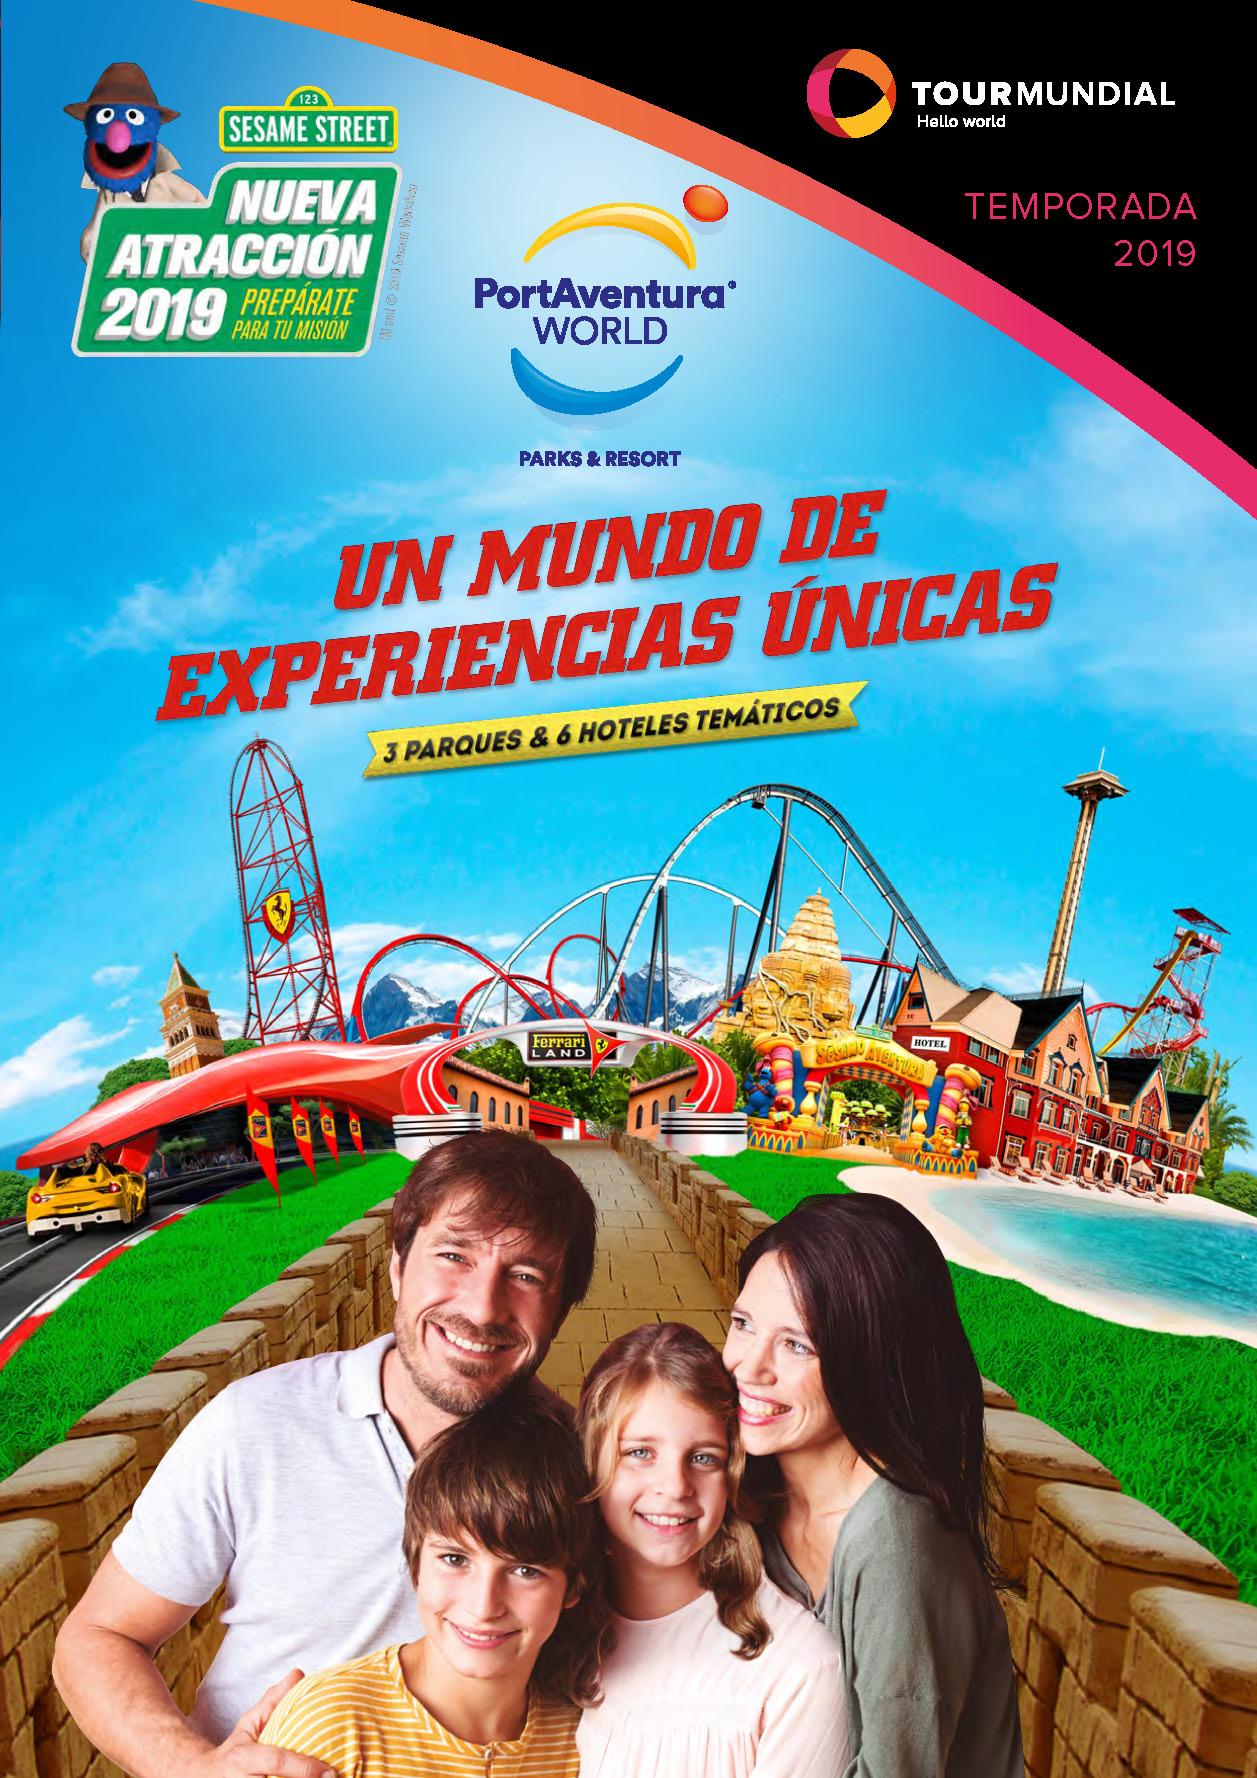 Catalogo Tourmundial Port Aventura World 2019